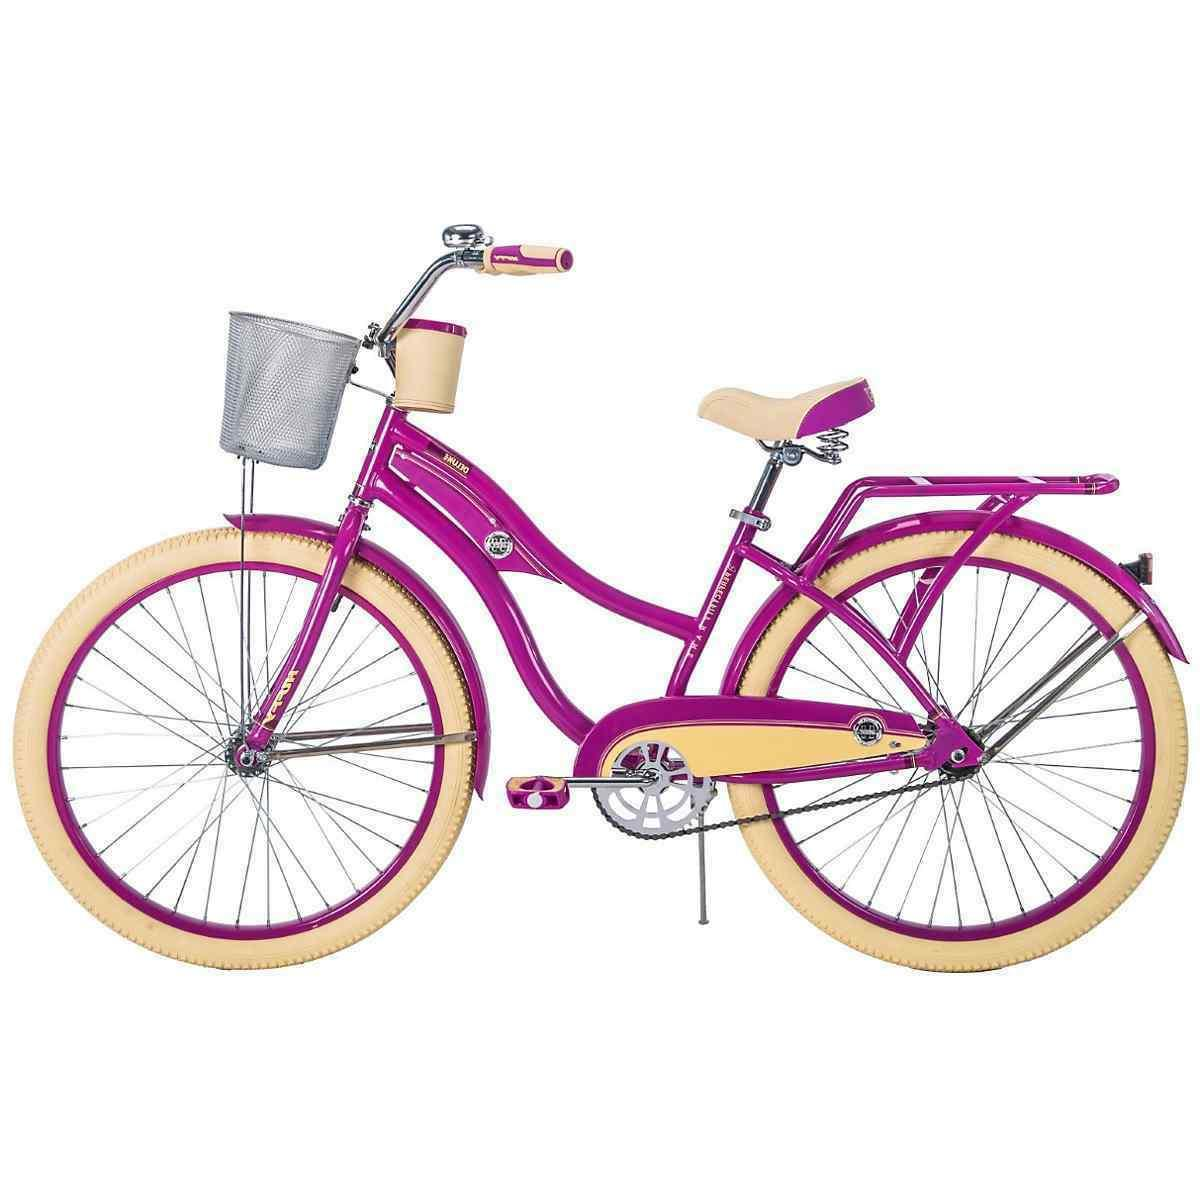 cruiser bike for women 26 inches purple